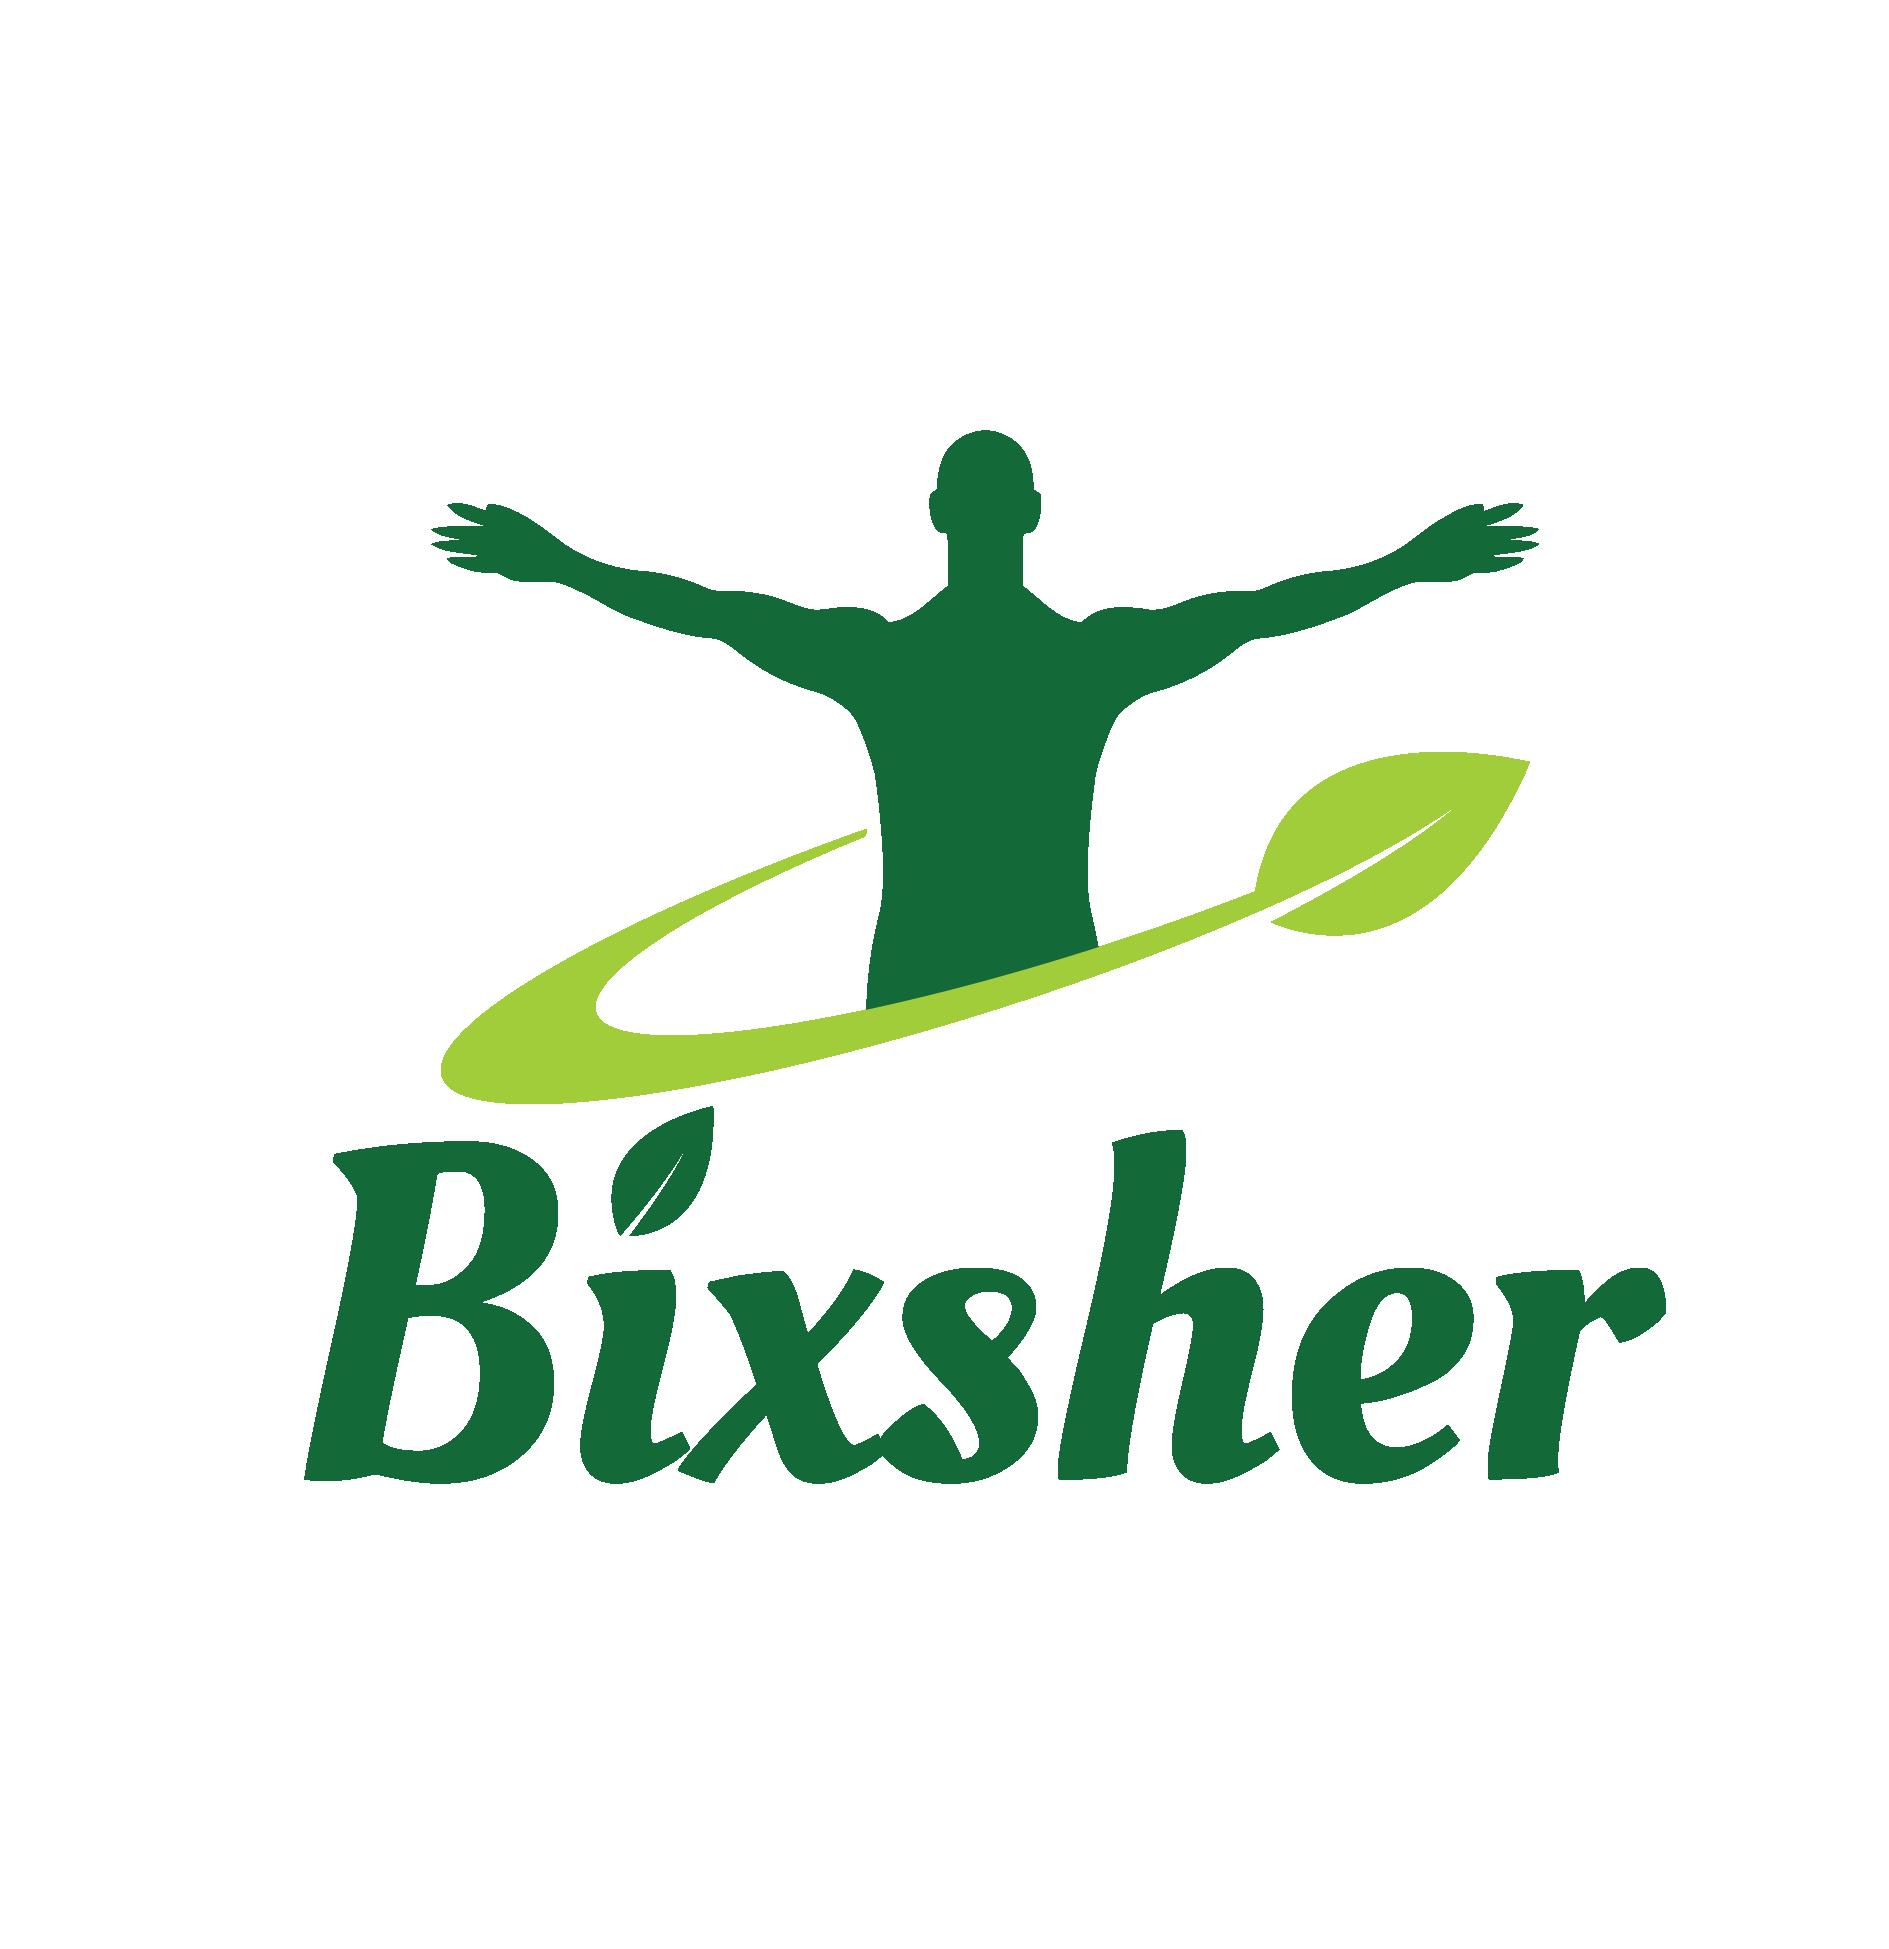 Bixsher